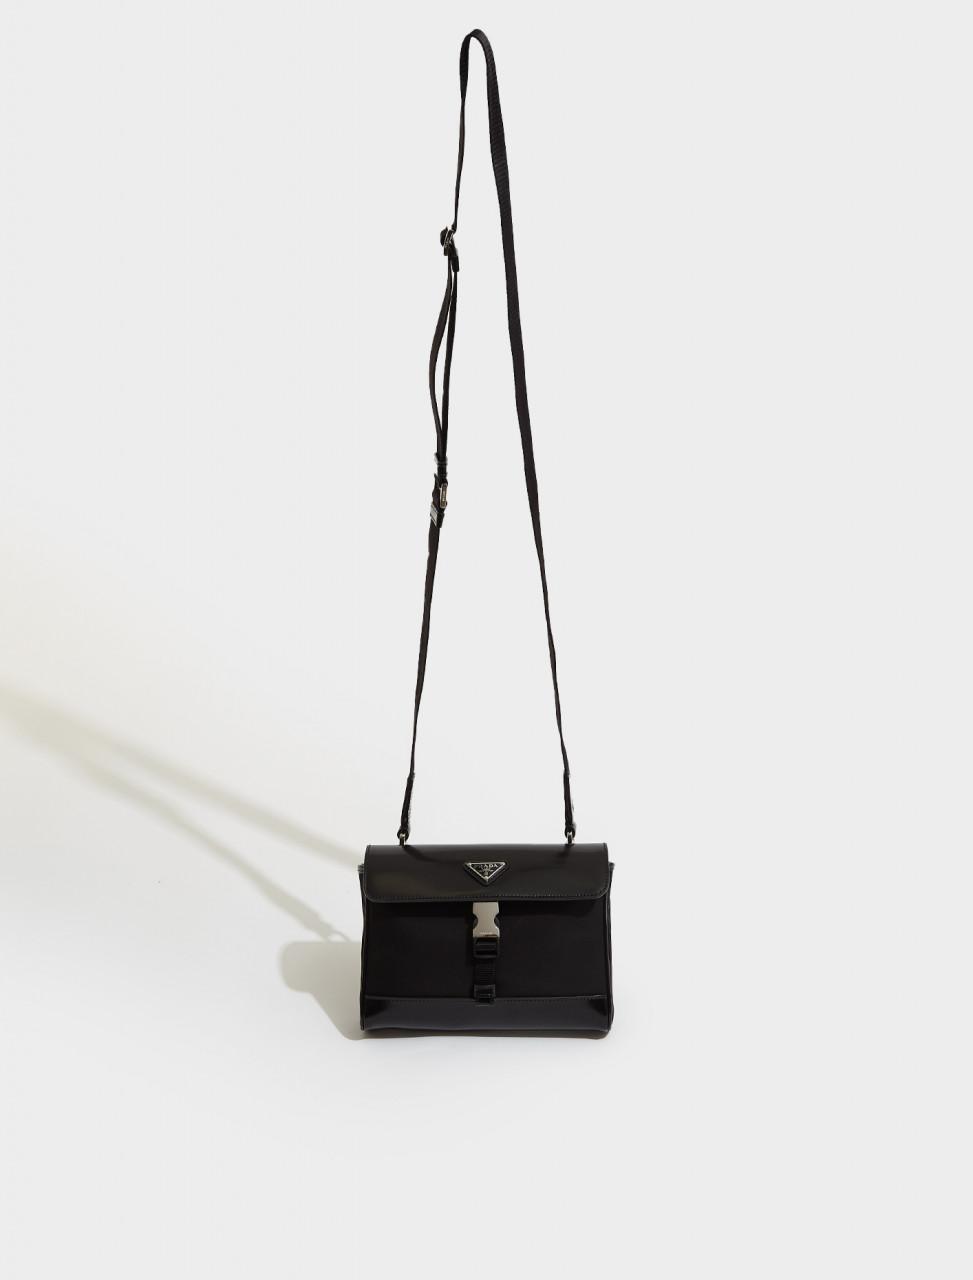 2VD044_789_F0002 PRADA RE NYLON AND LEATHER SHOULDER BAG IN BLACK